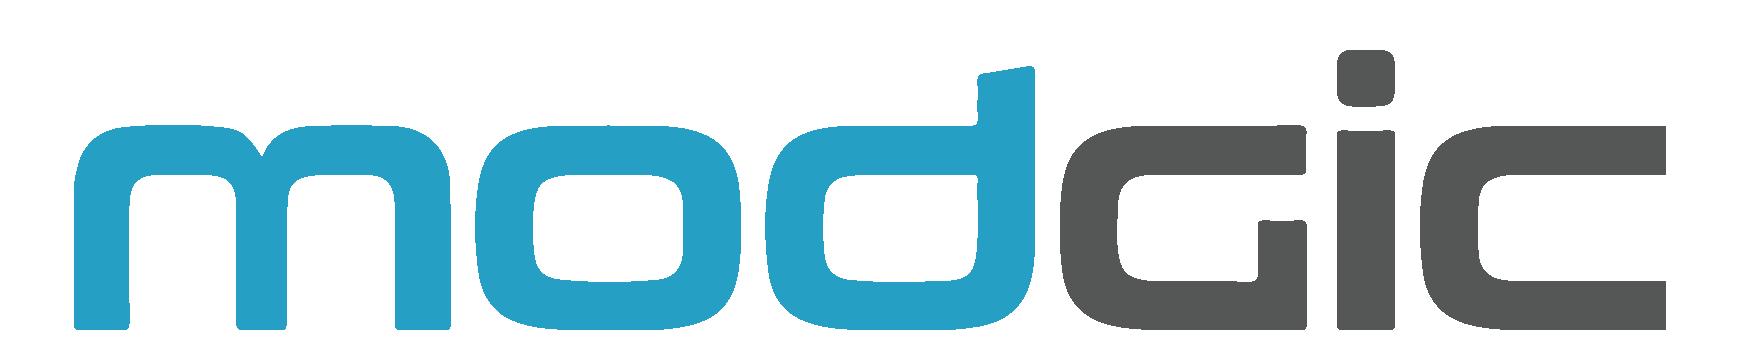 Main logo 1.png